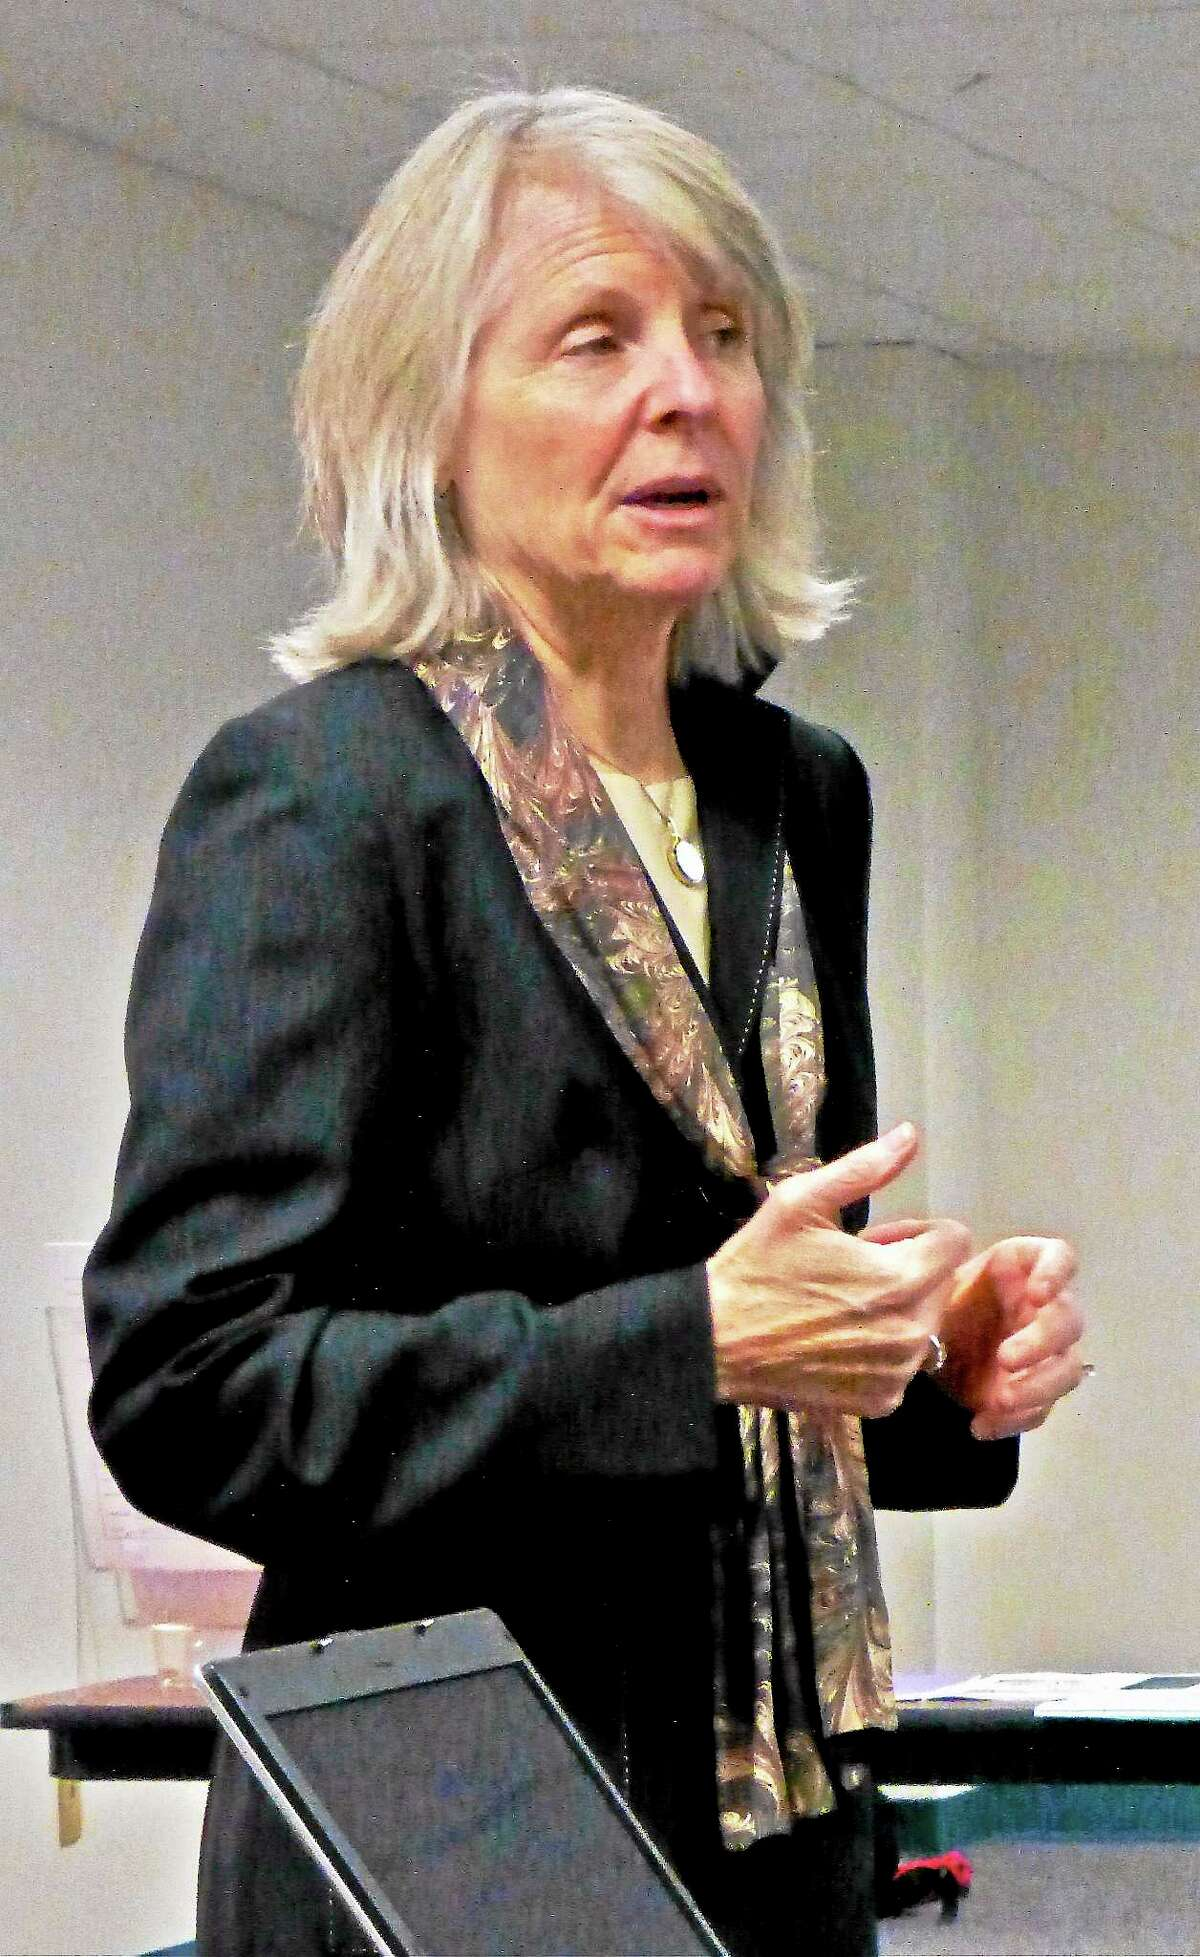 Department of Economic and Community Development Commissioner Catherine Smith